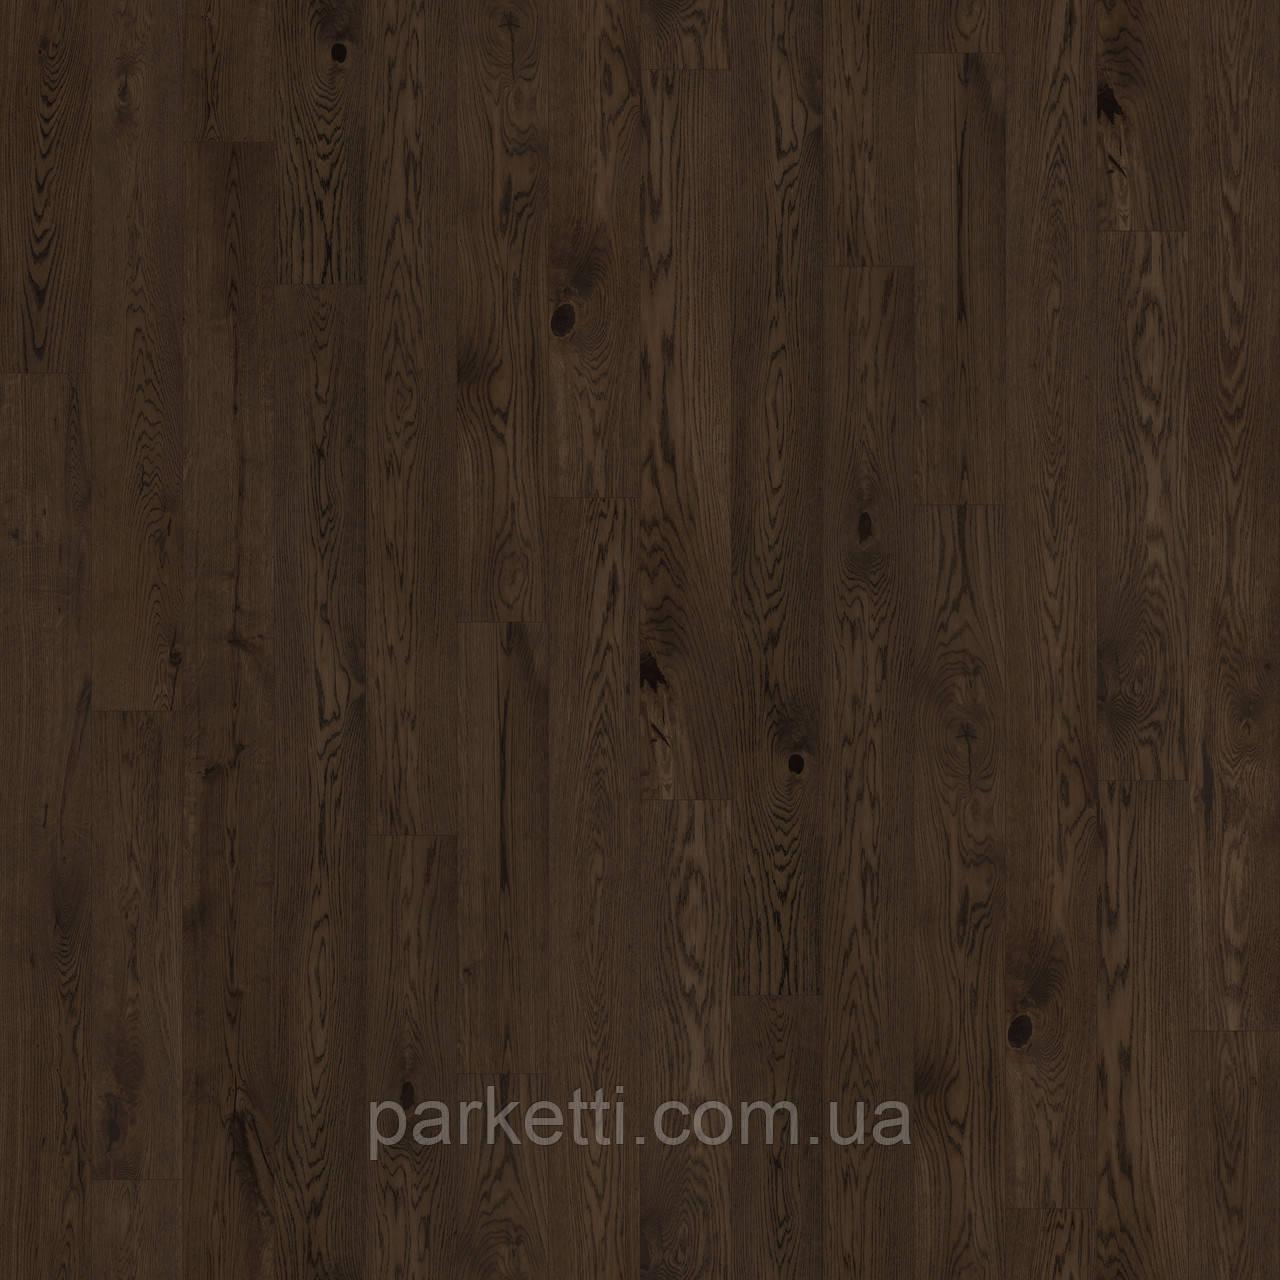 Bonnard Кантри Дуб Бурбон (Oak Bourbon) инженерная доска, ширина 127 мм